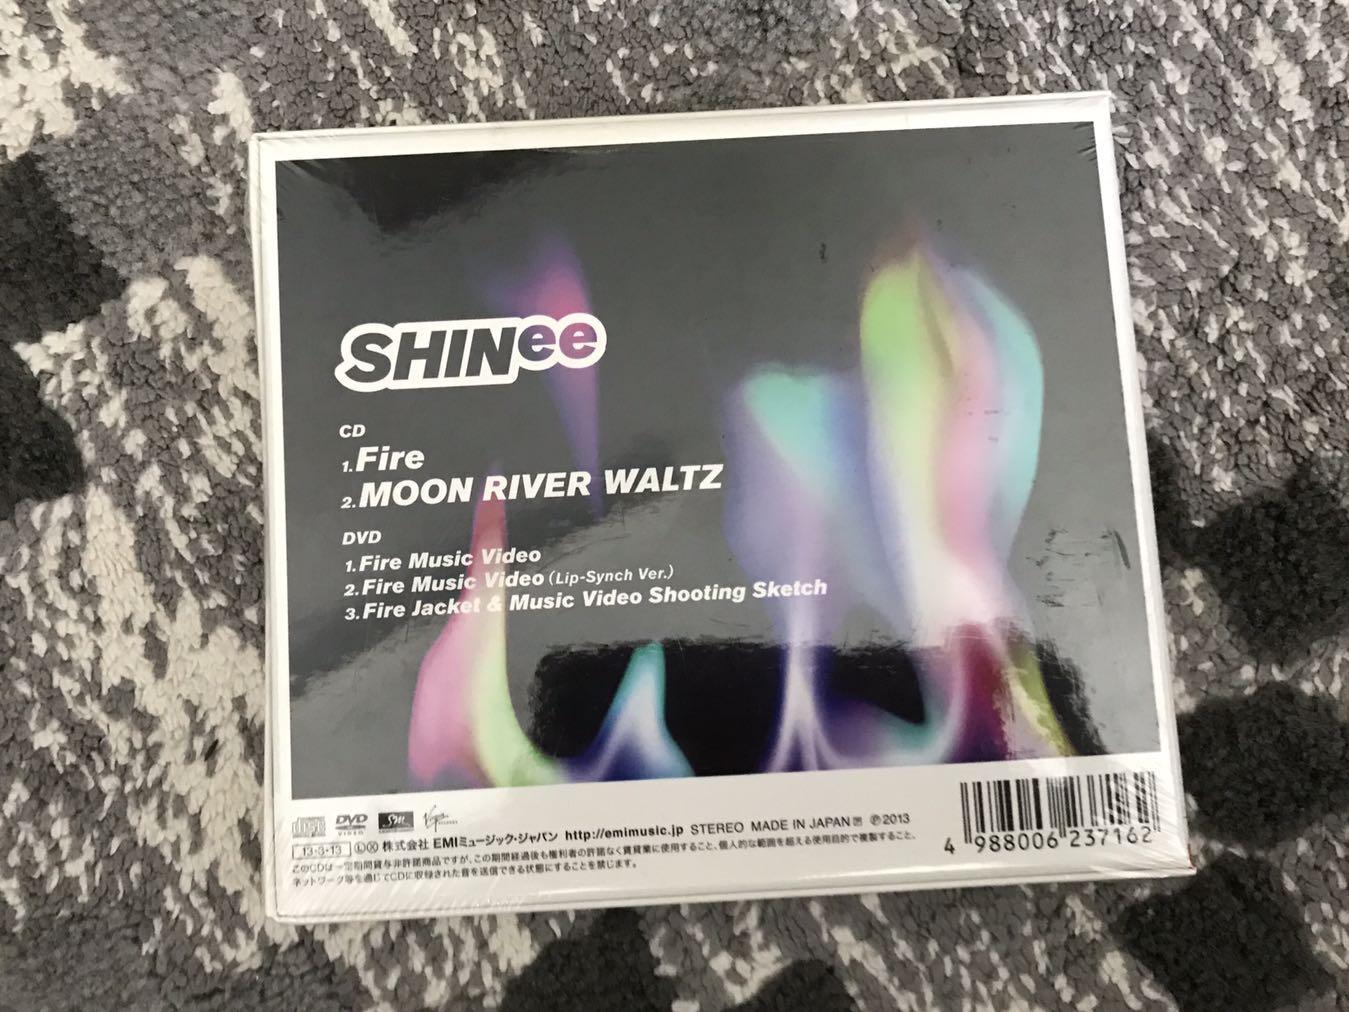 [Jpn Album] SHINee - FIRE (Japan version, CD & DVD)